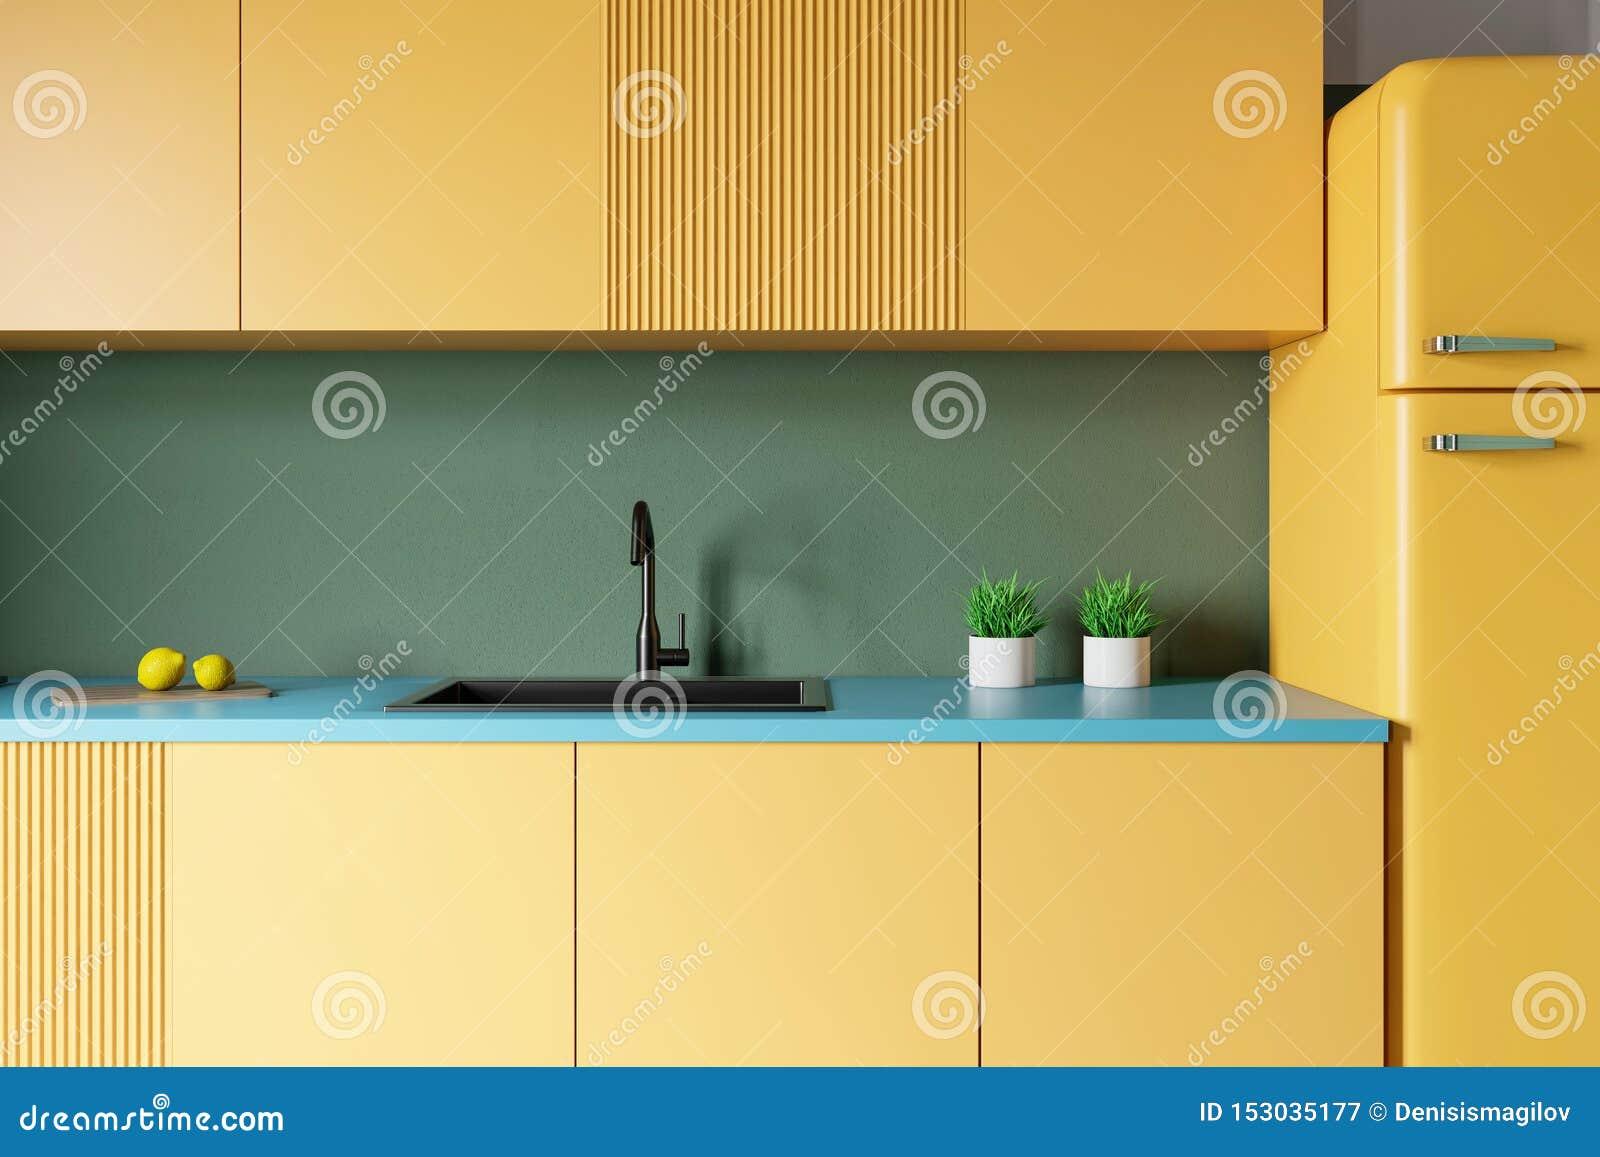 Yellow Countertops In Green Kitchen Stock Illustration ...